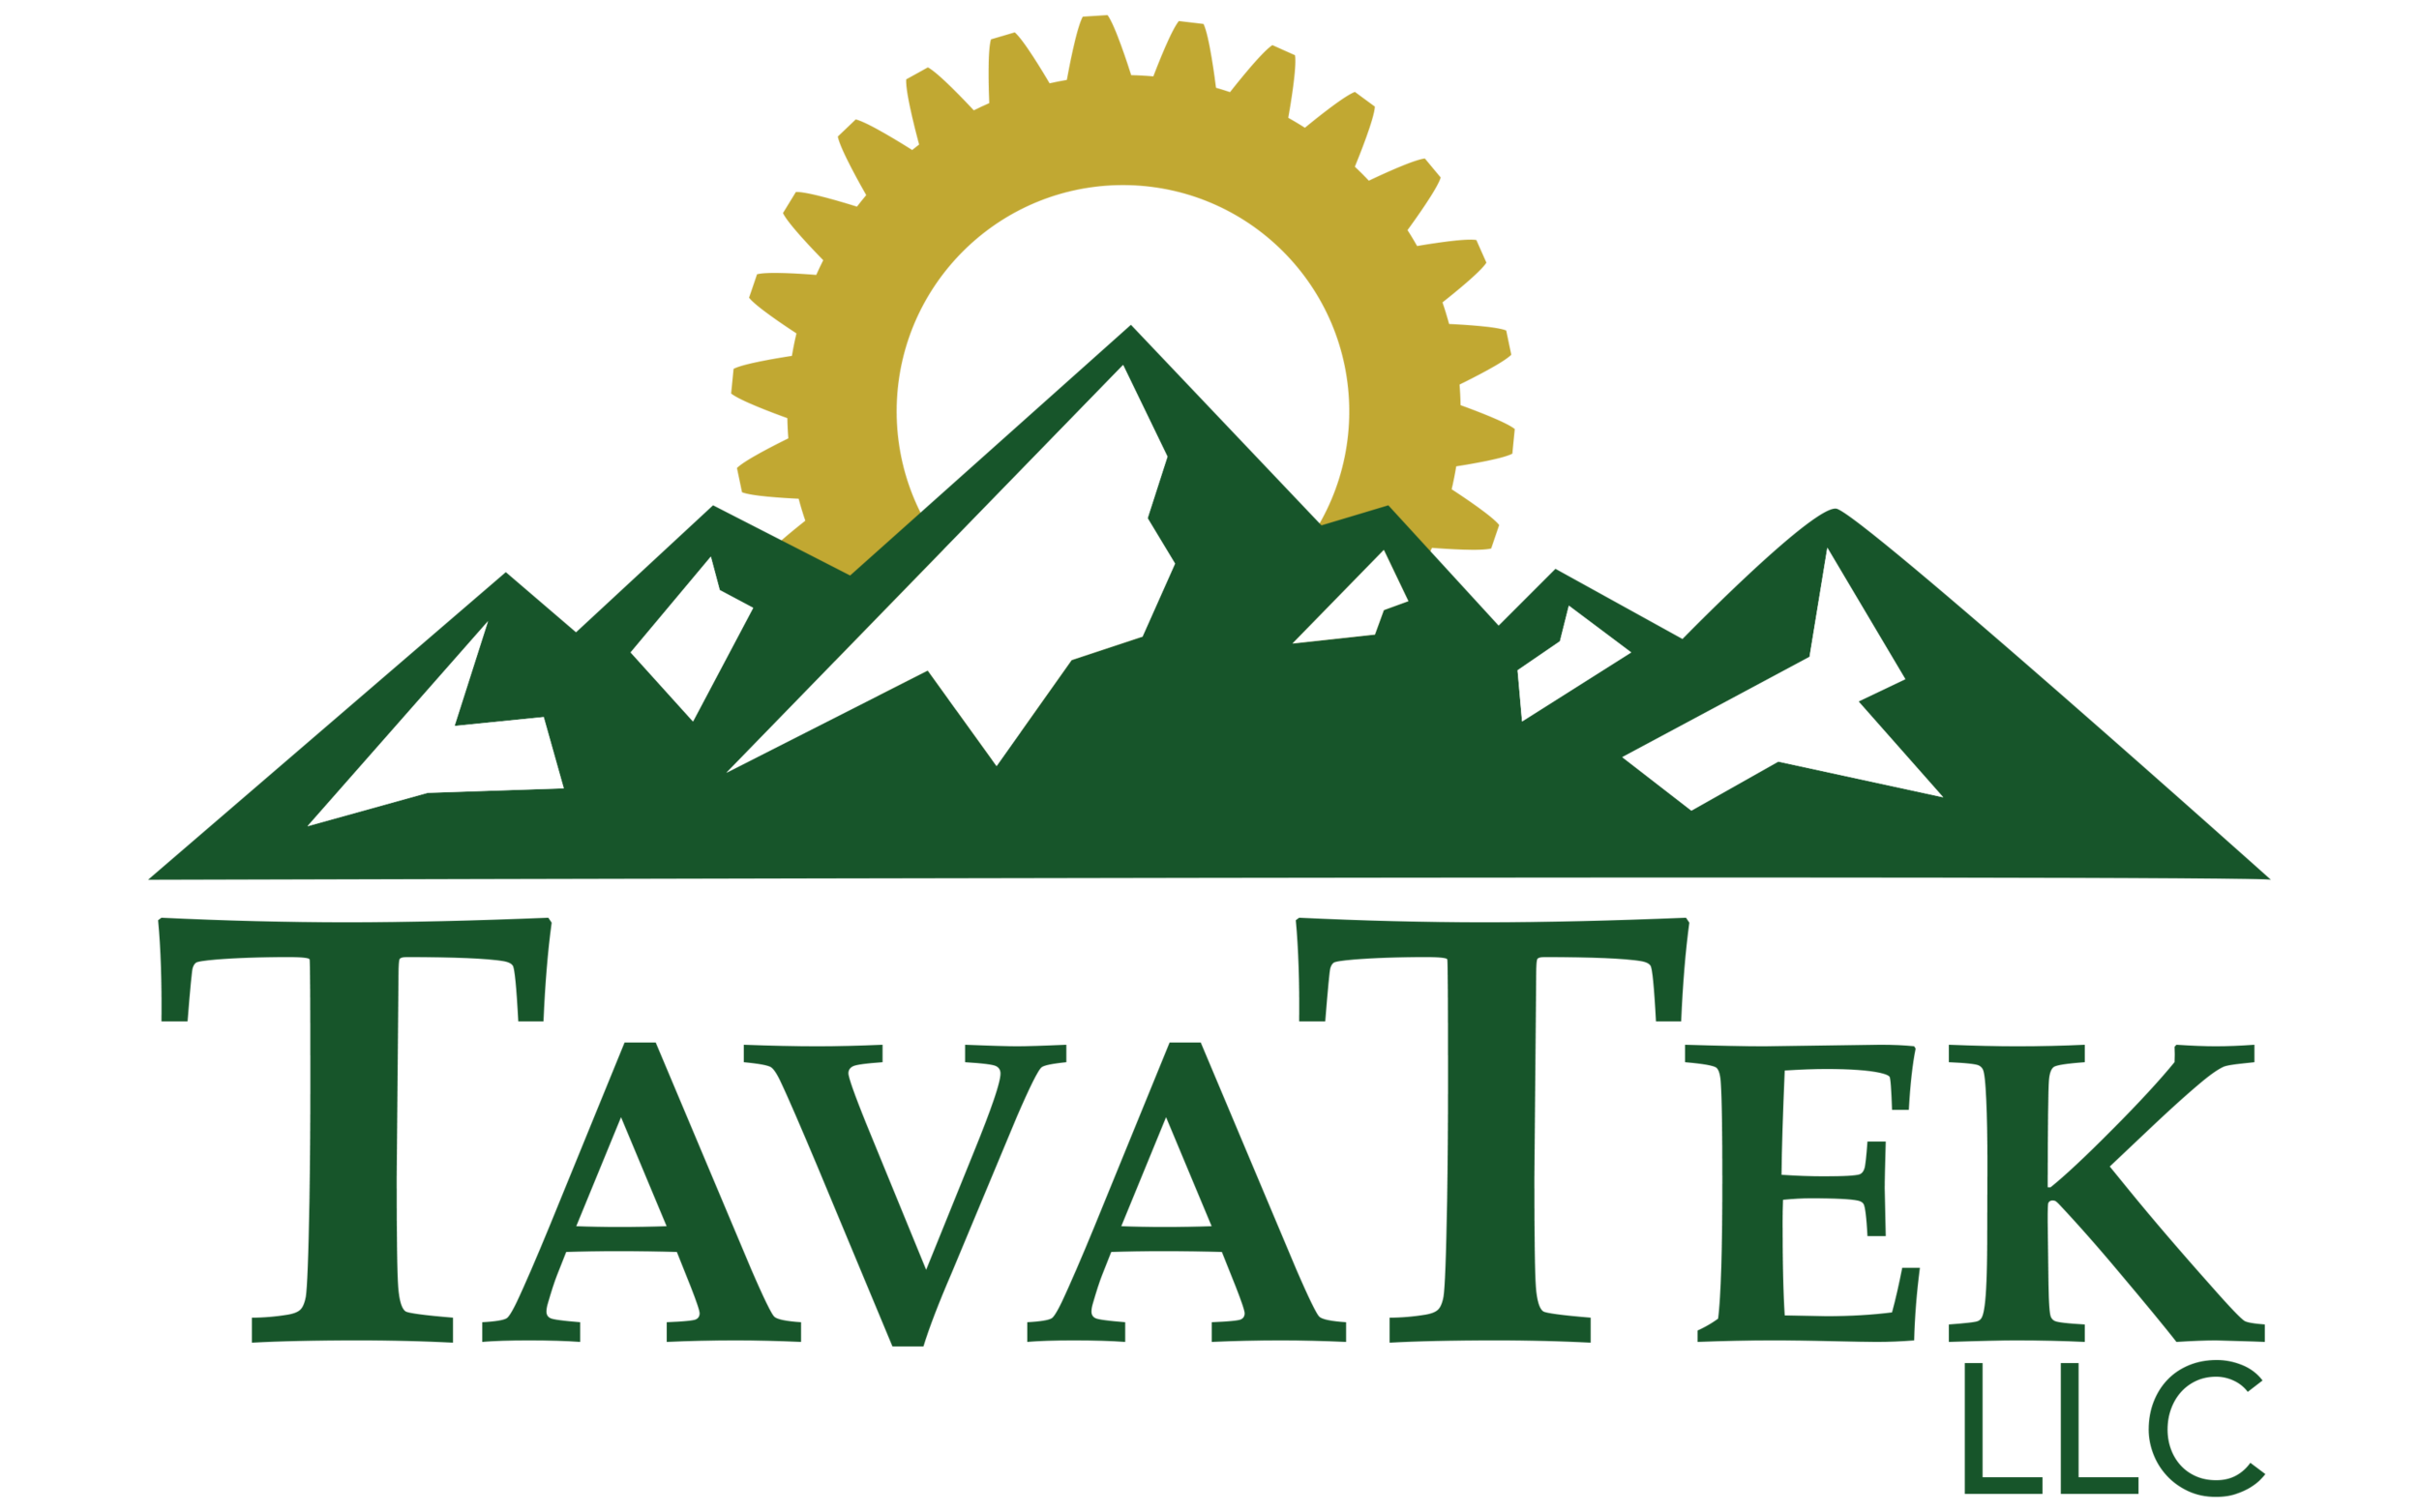 TavaTek_transparent.png